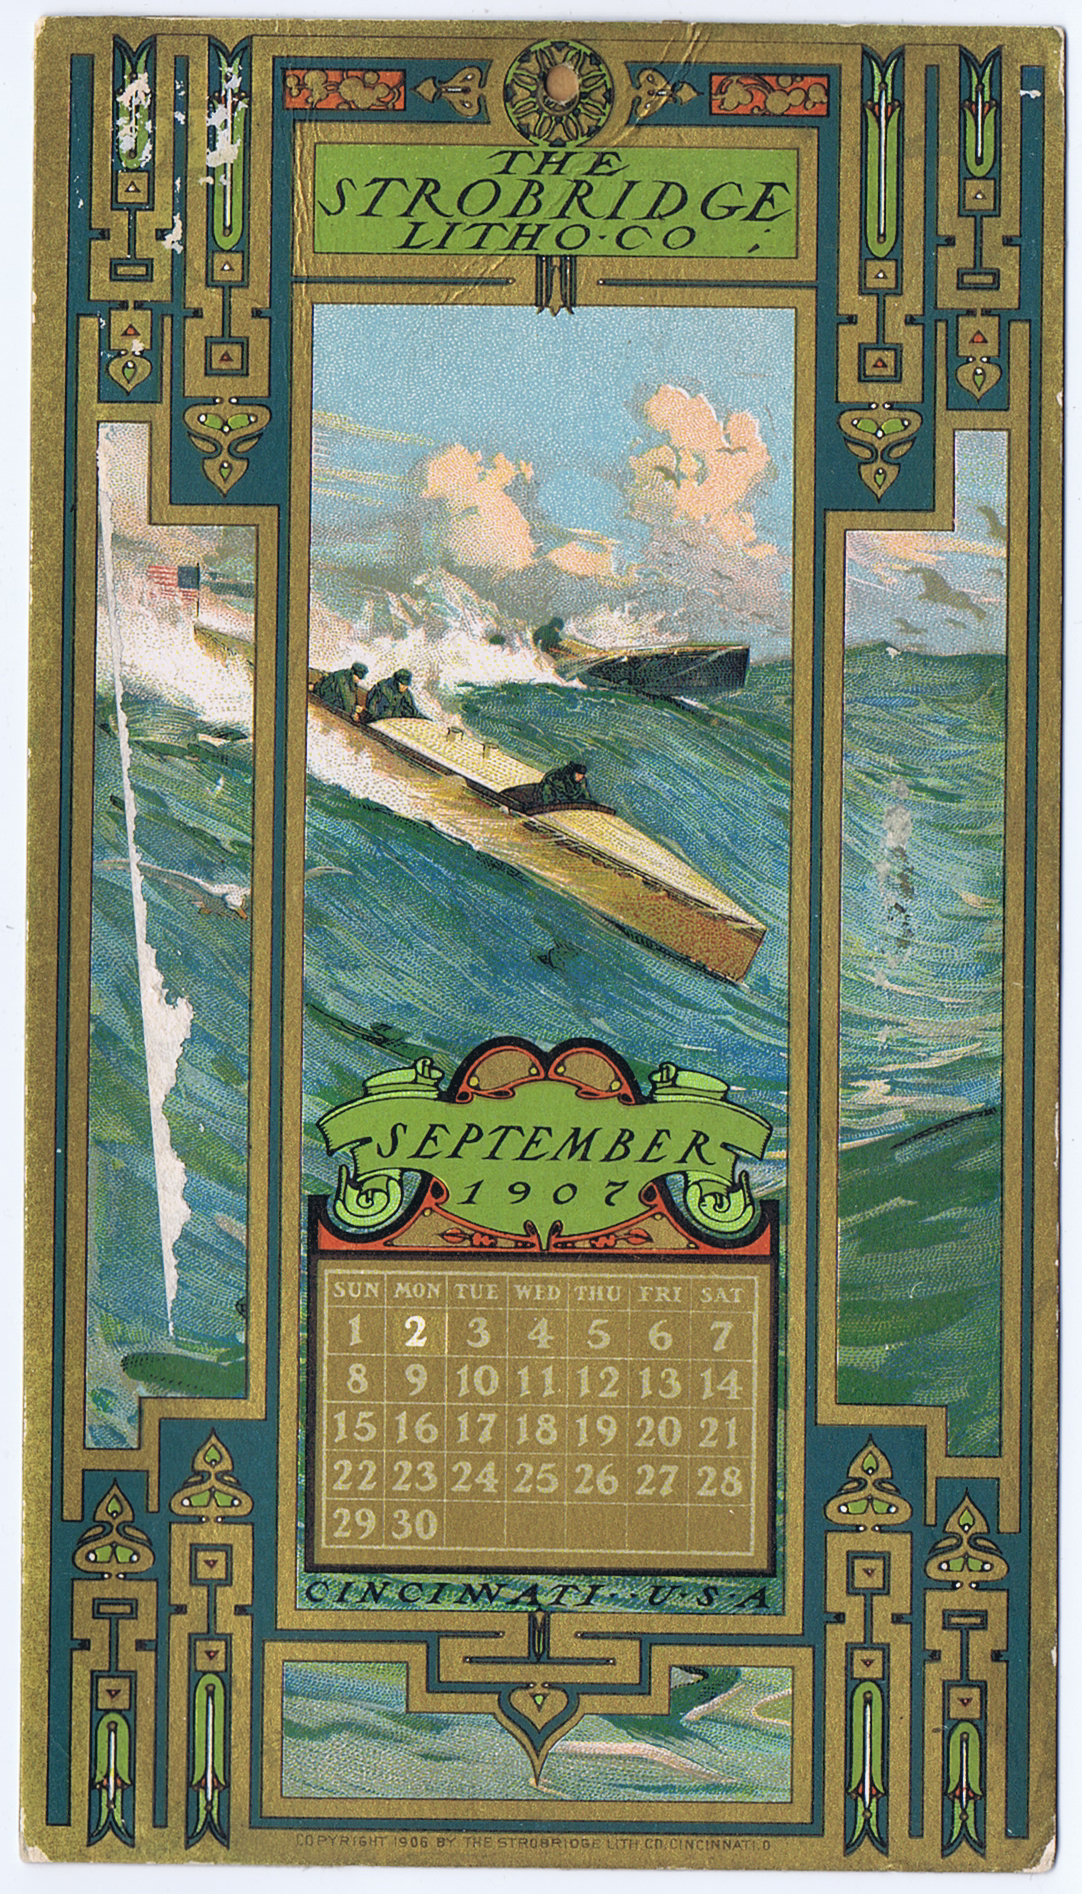 J448STROBRIDGE CALENDAR CARD SEPTEMBER 1907